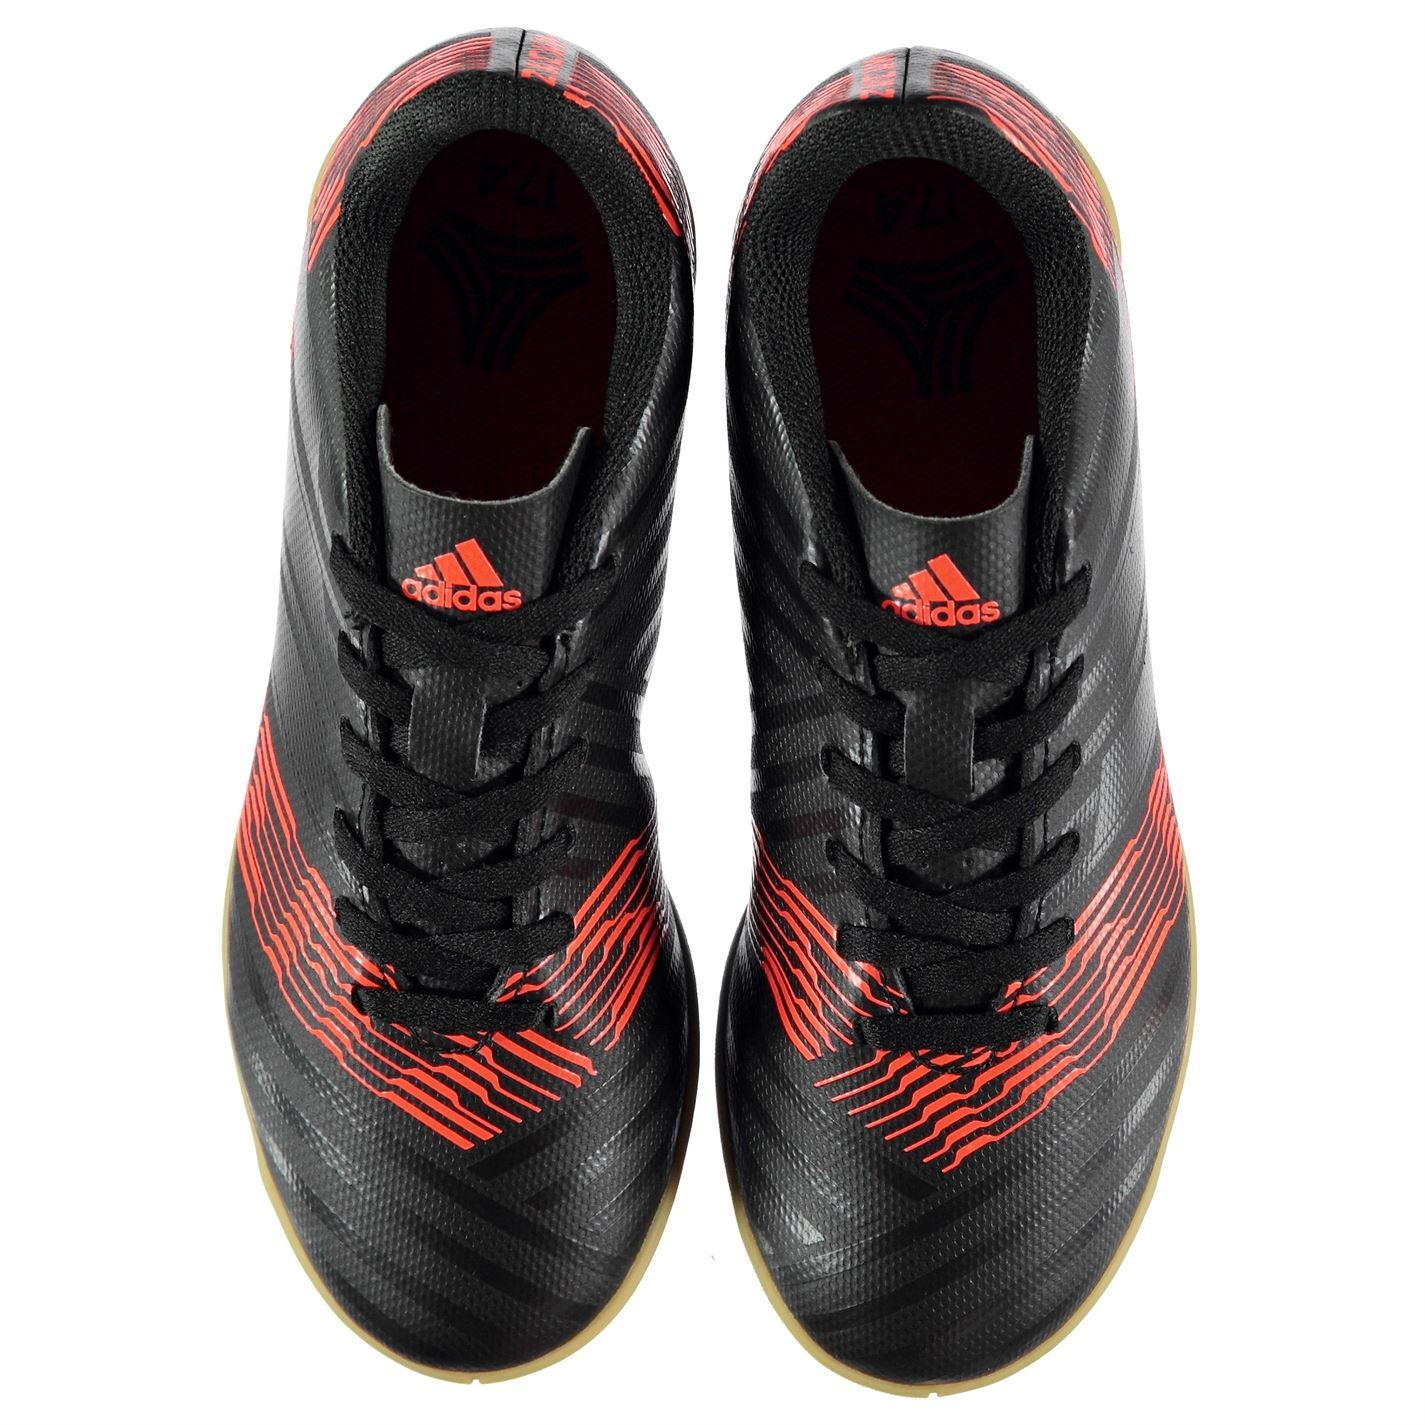 02aba9e46 adidas Nemeziz Tango 17.4 Indoor Football Trainers Childs Black Soccer Shoes